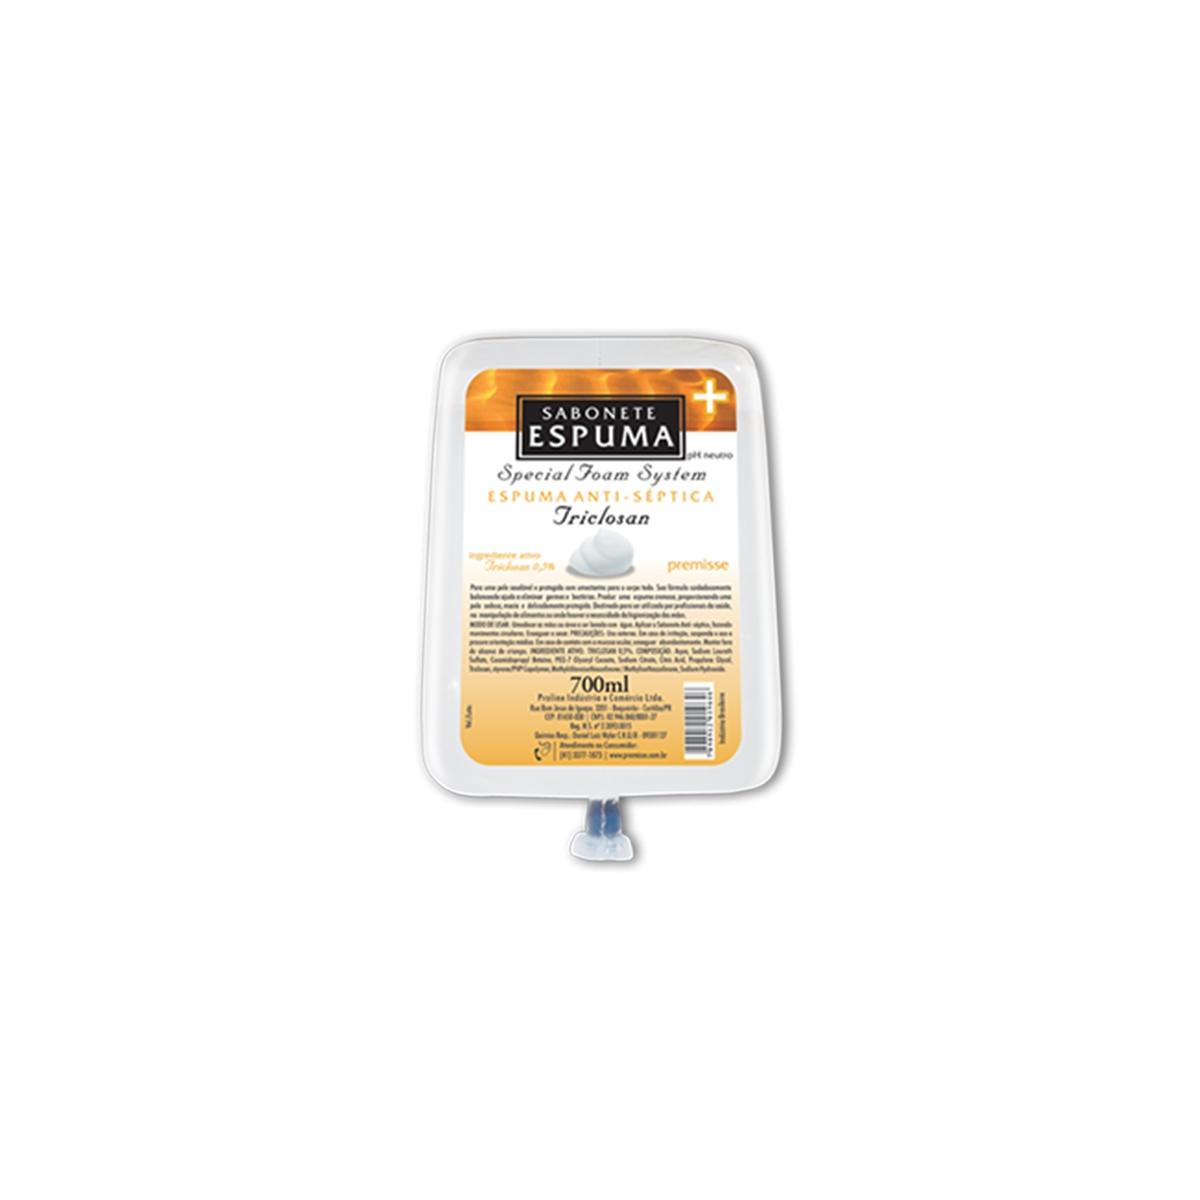 CÓD. 10204 - Sabonete Espuma Antisséptico Triclosan 0,5% Sem Álcool - 700Ml